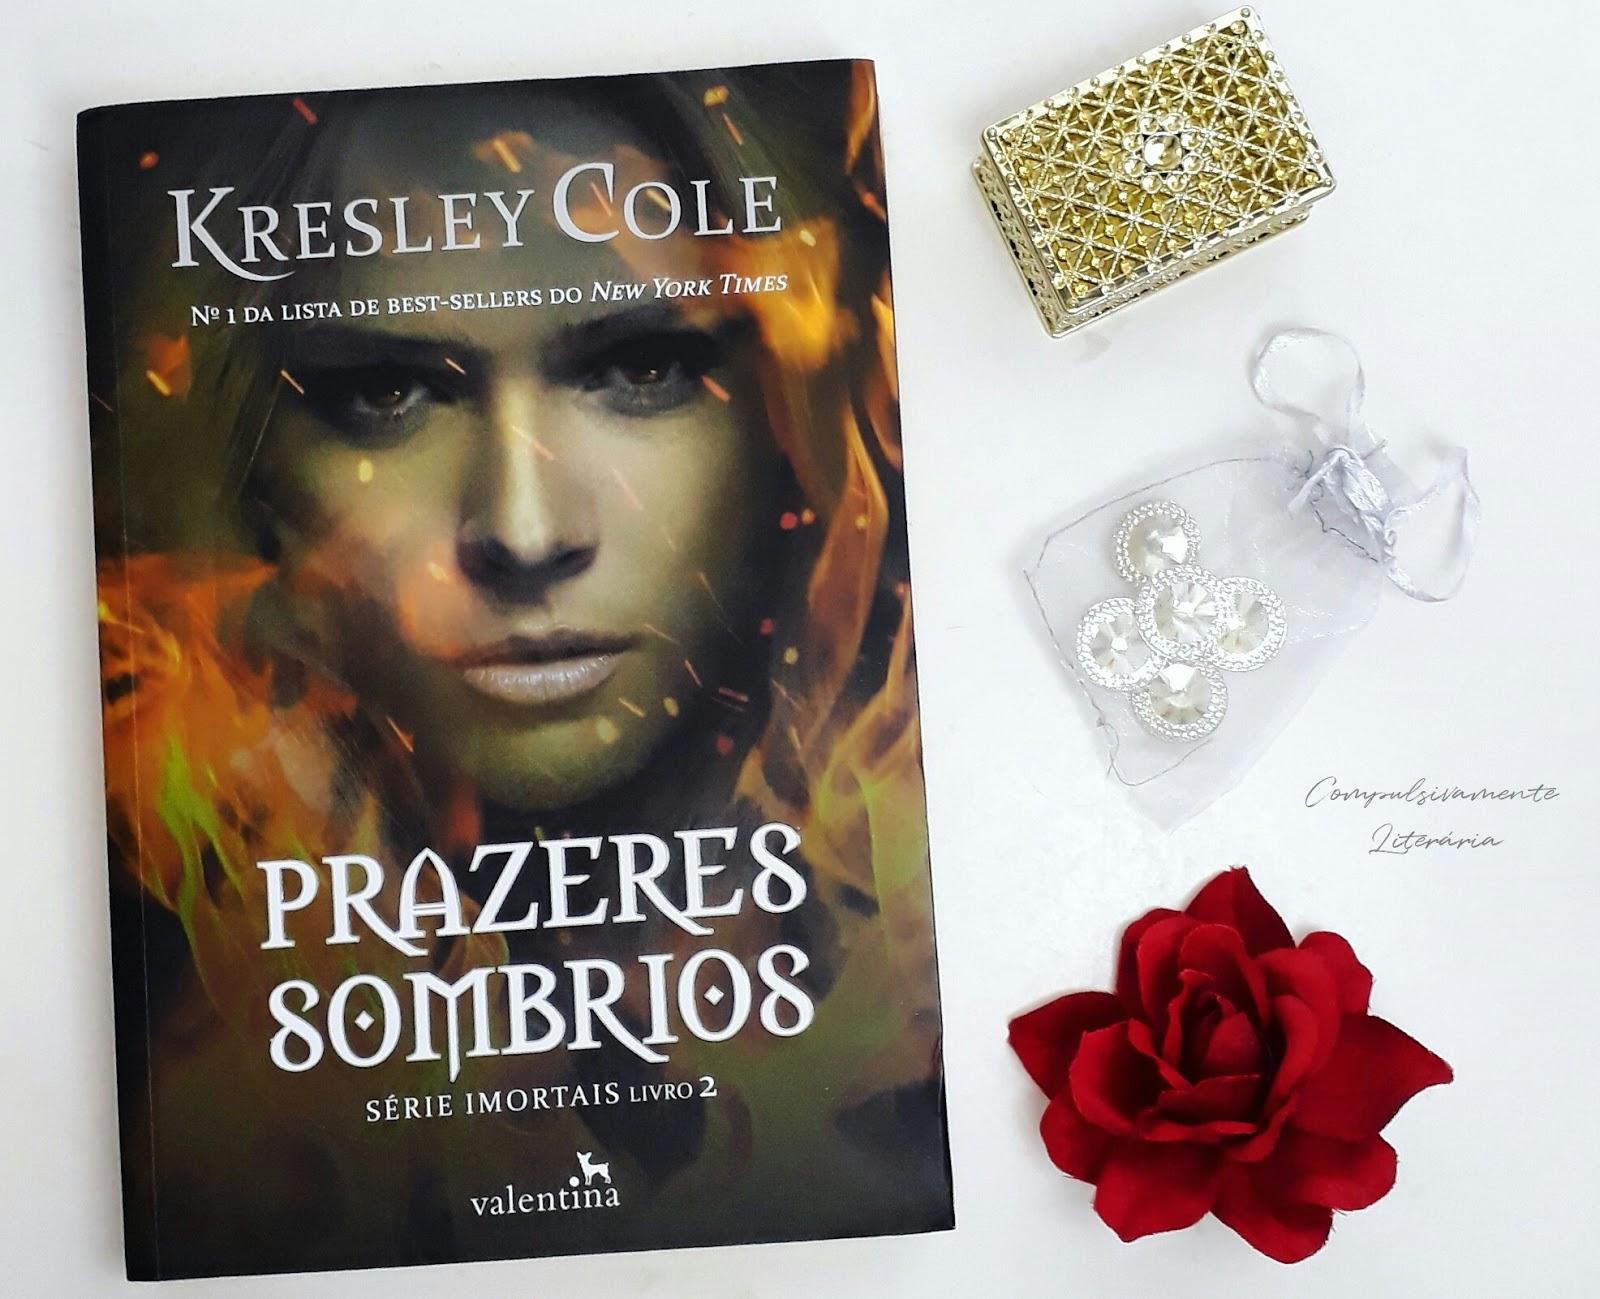 Kresley cole imortais 02 prazeres sombrios compulsivamente kresley cole imortais 02 prazeres sombrios fandeluxe Images